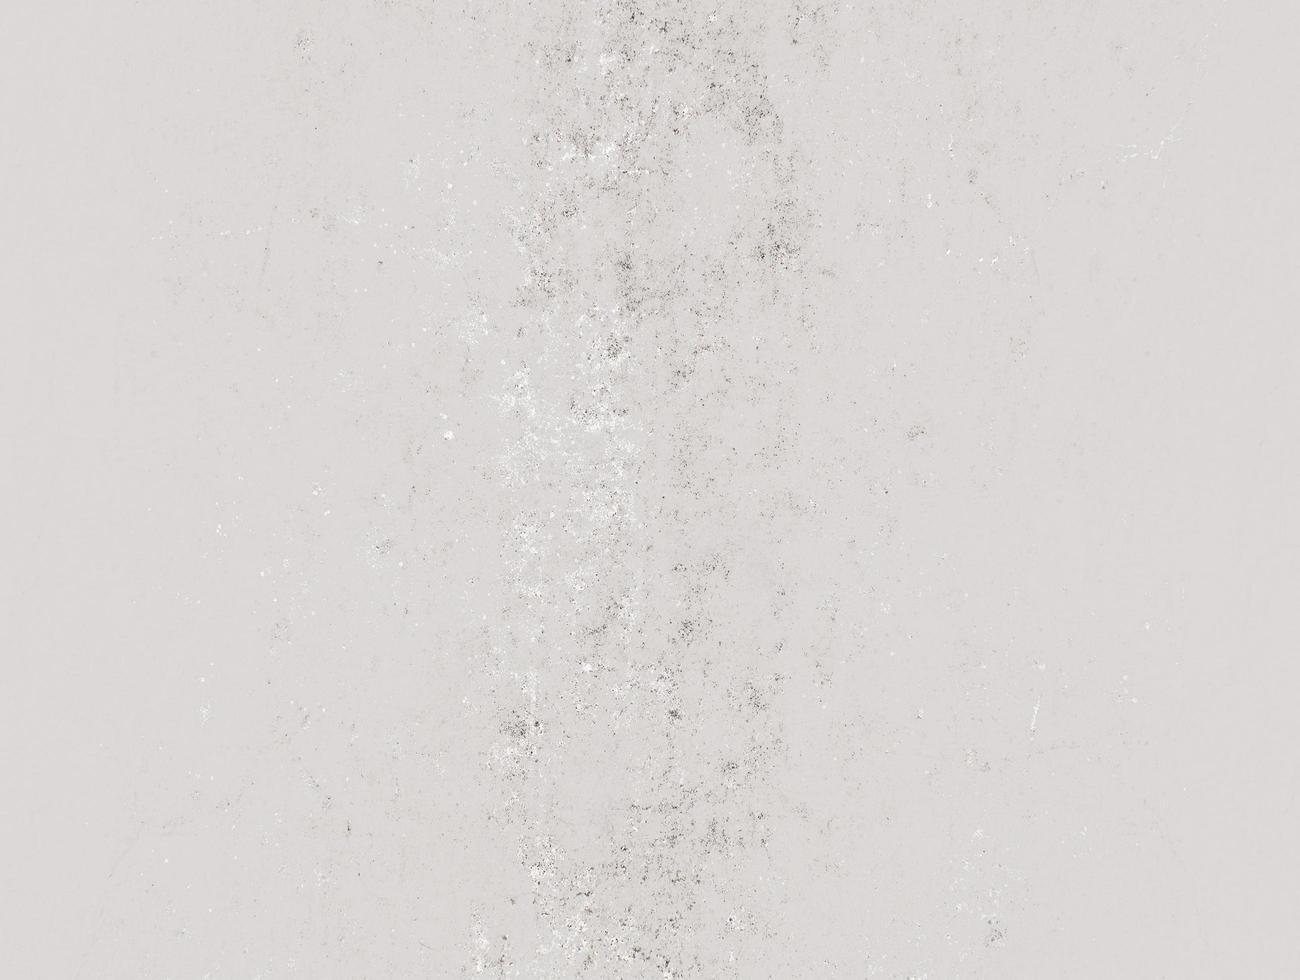 neutrale schone muurtextuur foto